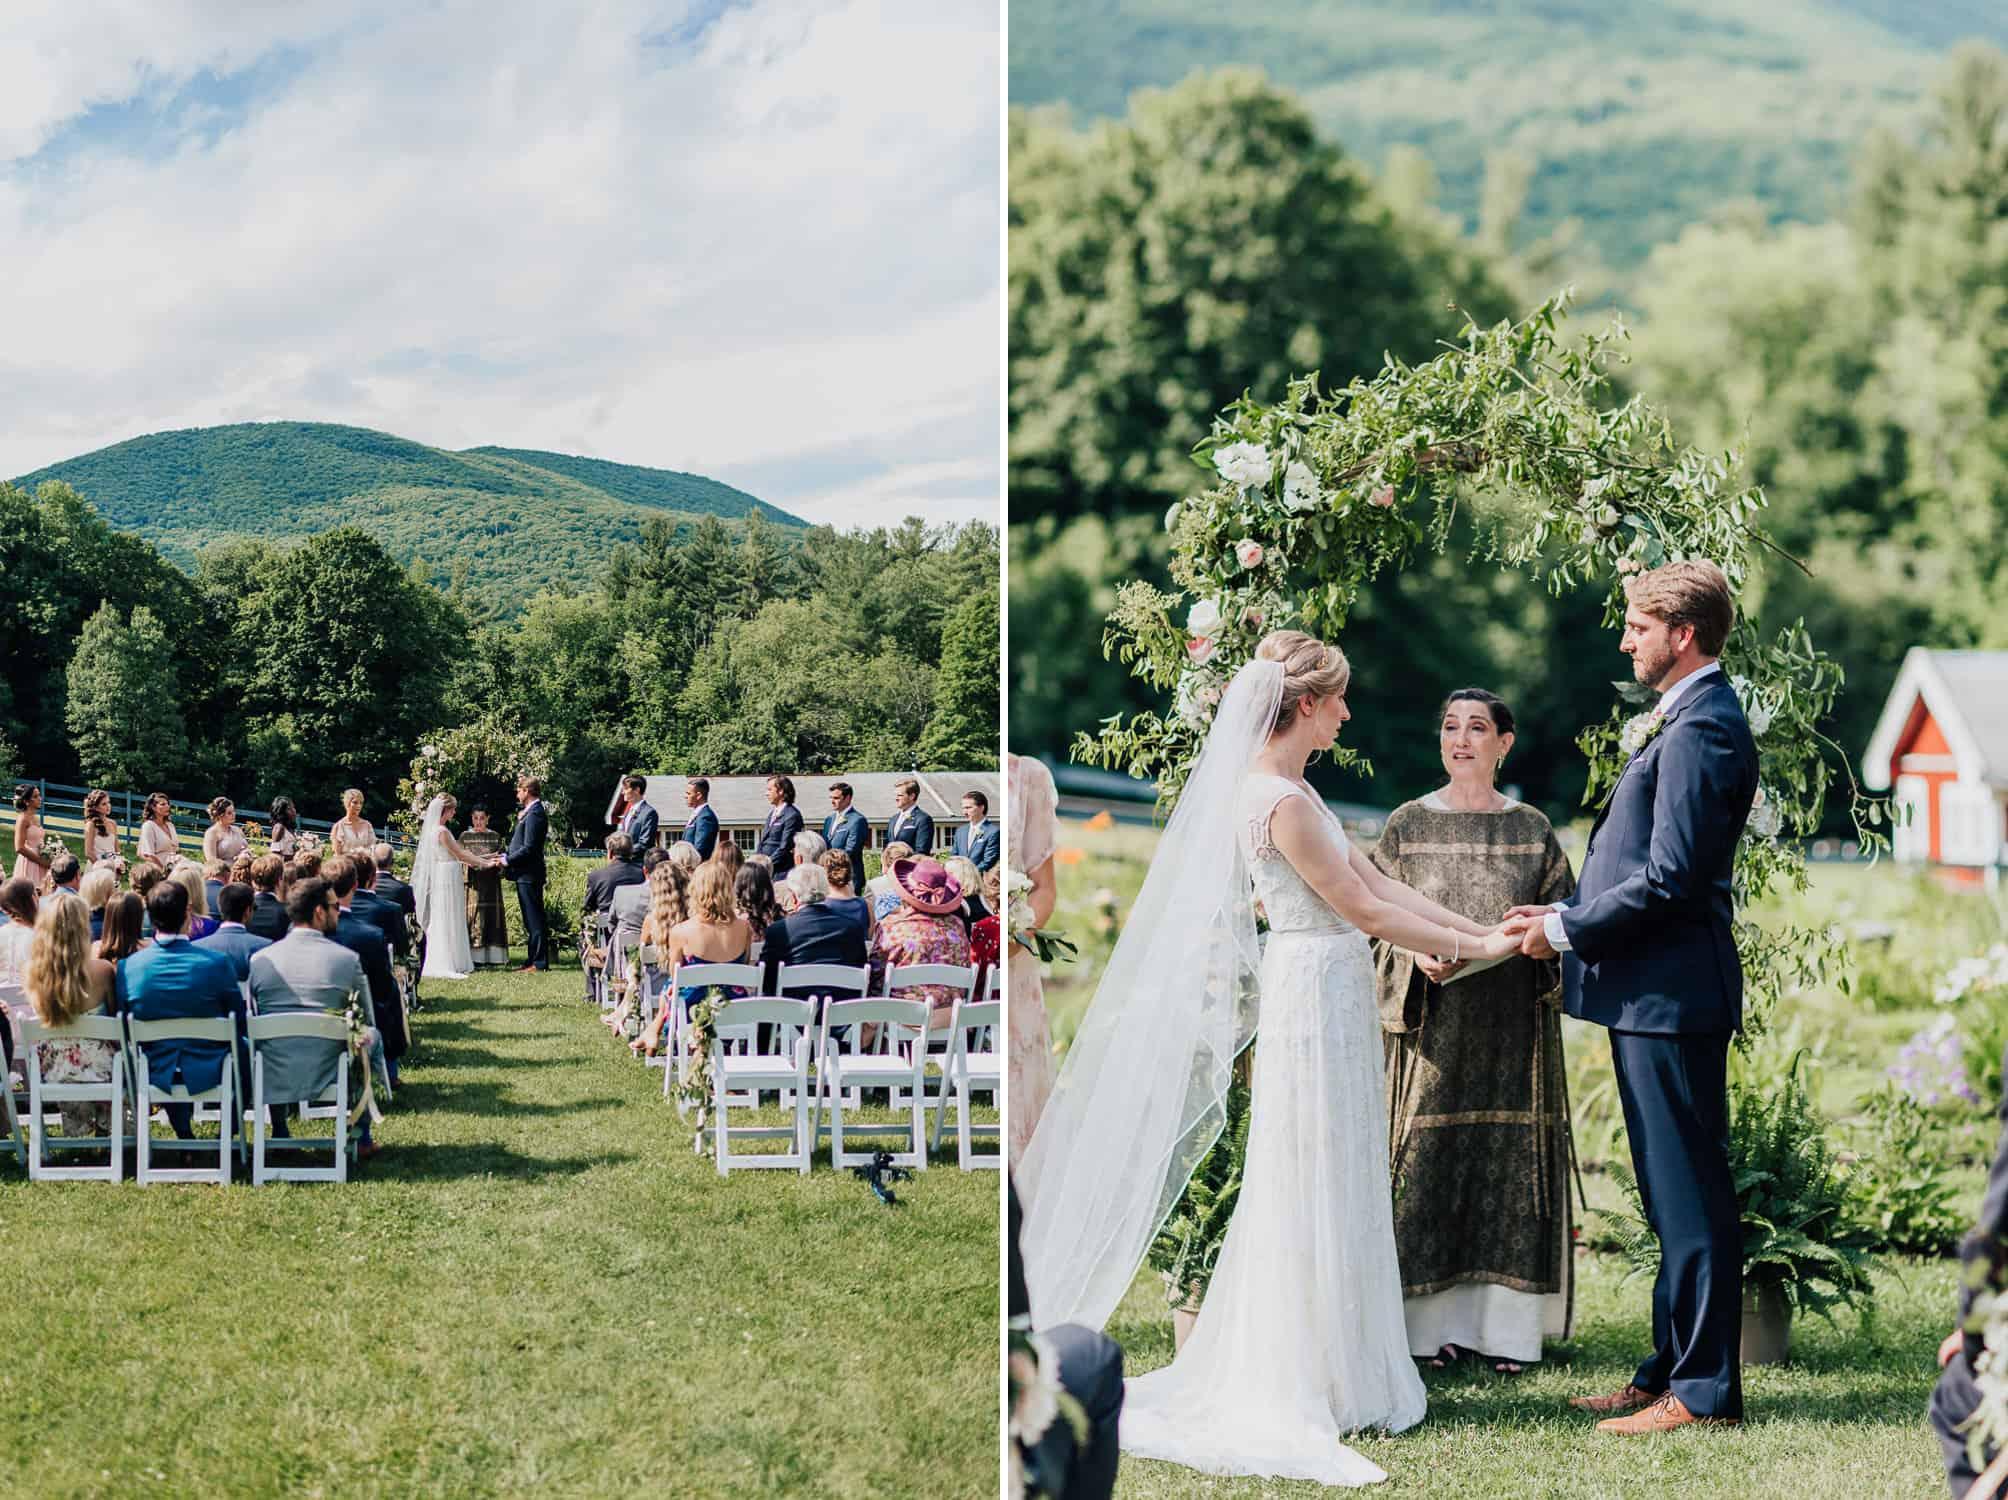 Vermont Green Mountain West Mountain Inn Wedding